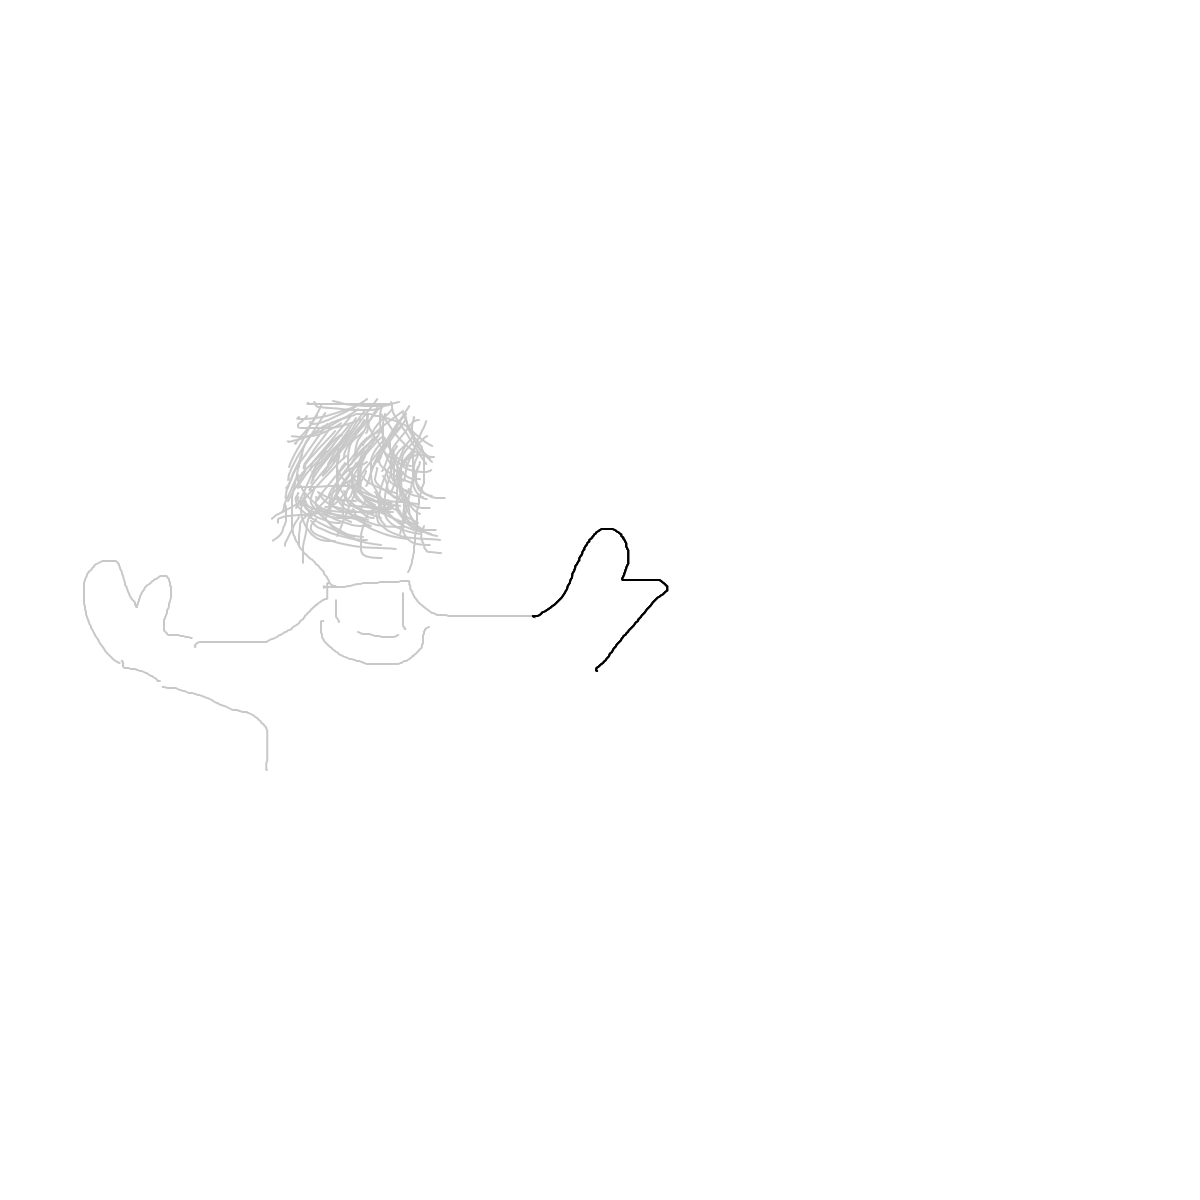 BAAAM drawing#5255 lat:39.9655990600585940lng: -75.1809005737304700